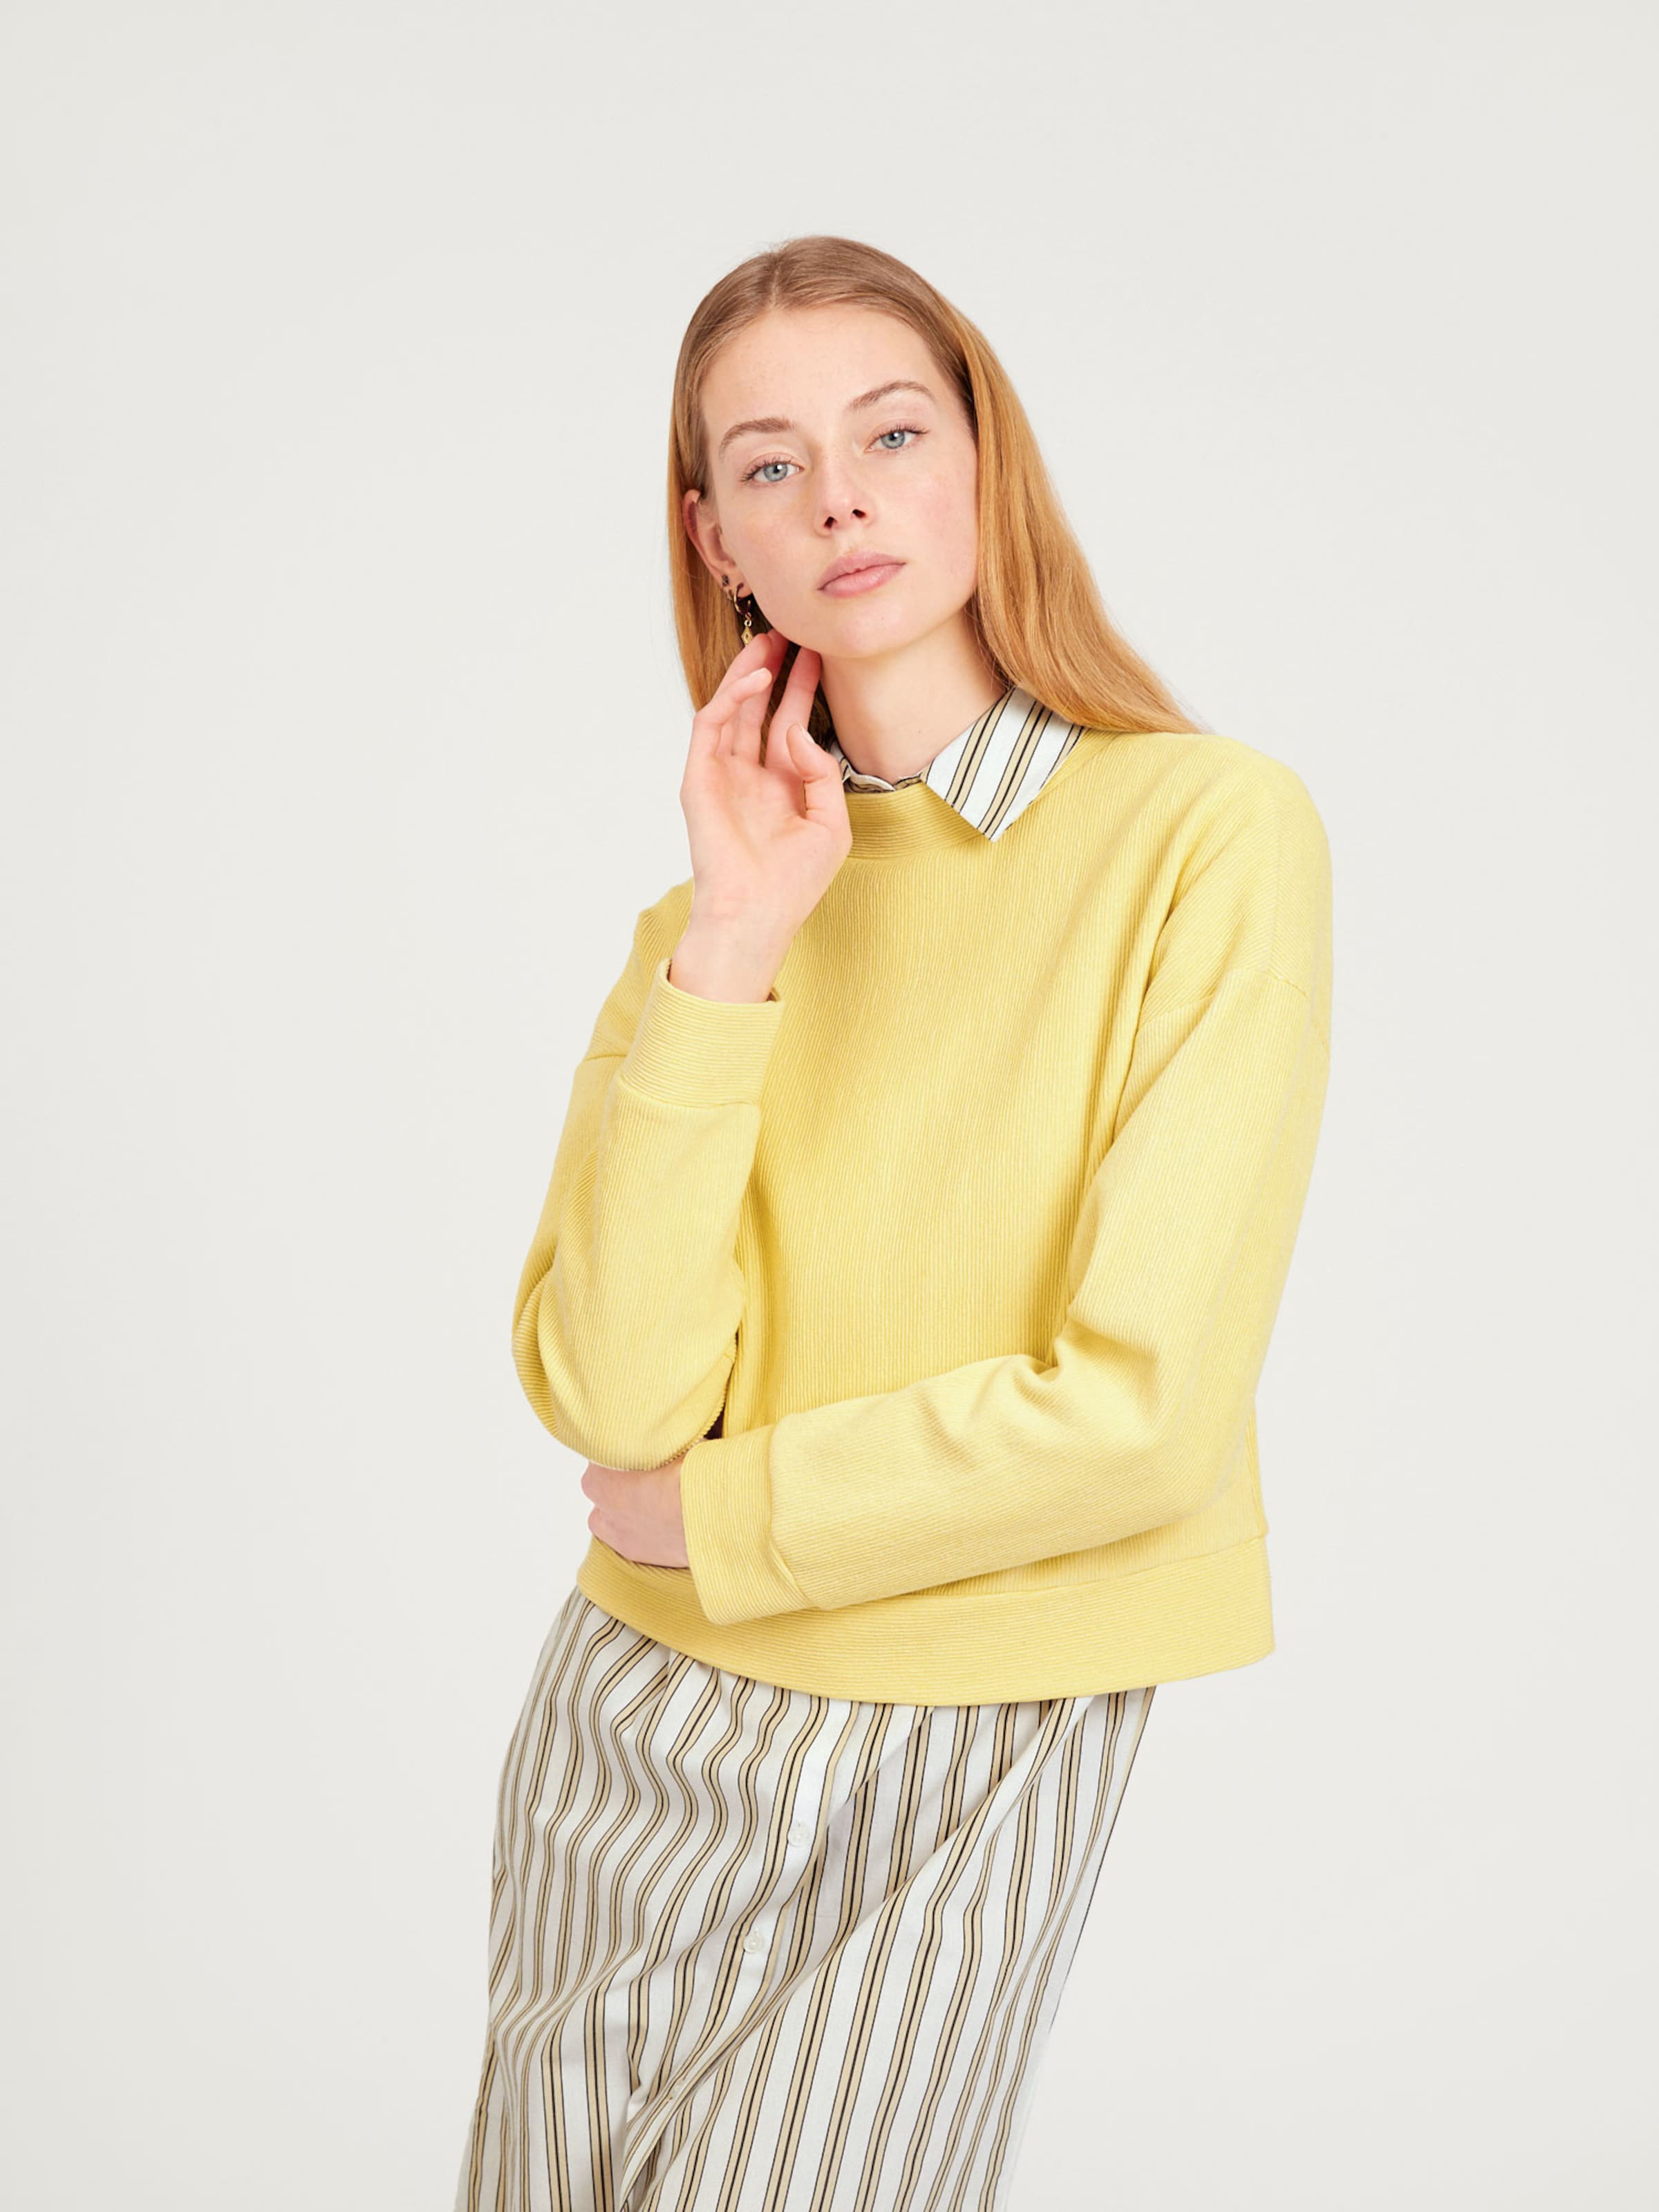 Sweatshirt 'fidelia' 'fidelia' Sweatshirt Gelb Edited In Edited VLqSMpGjUz